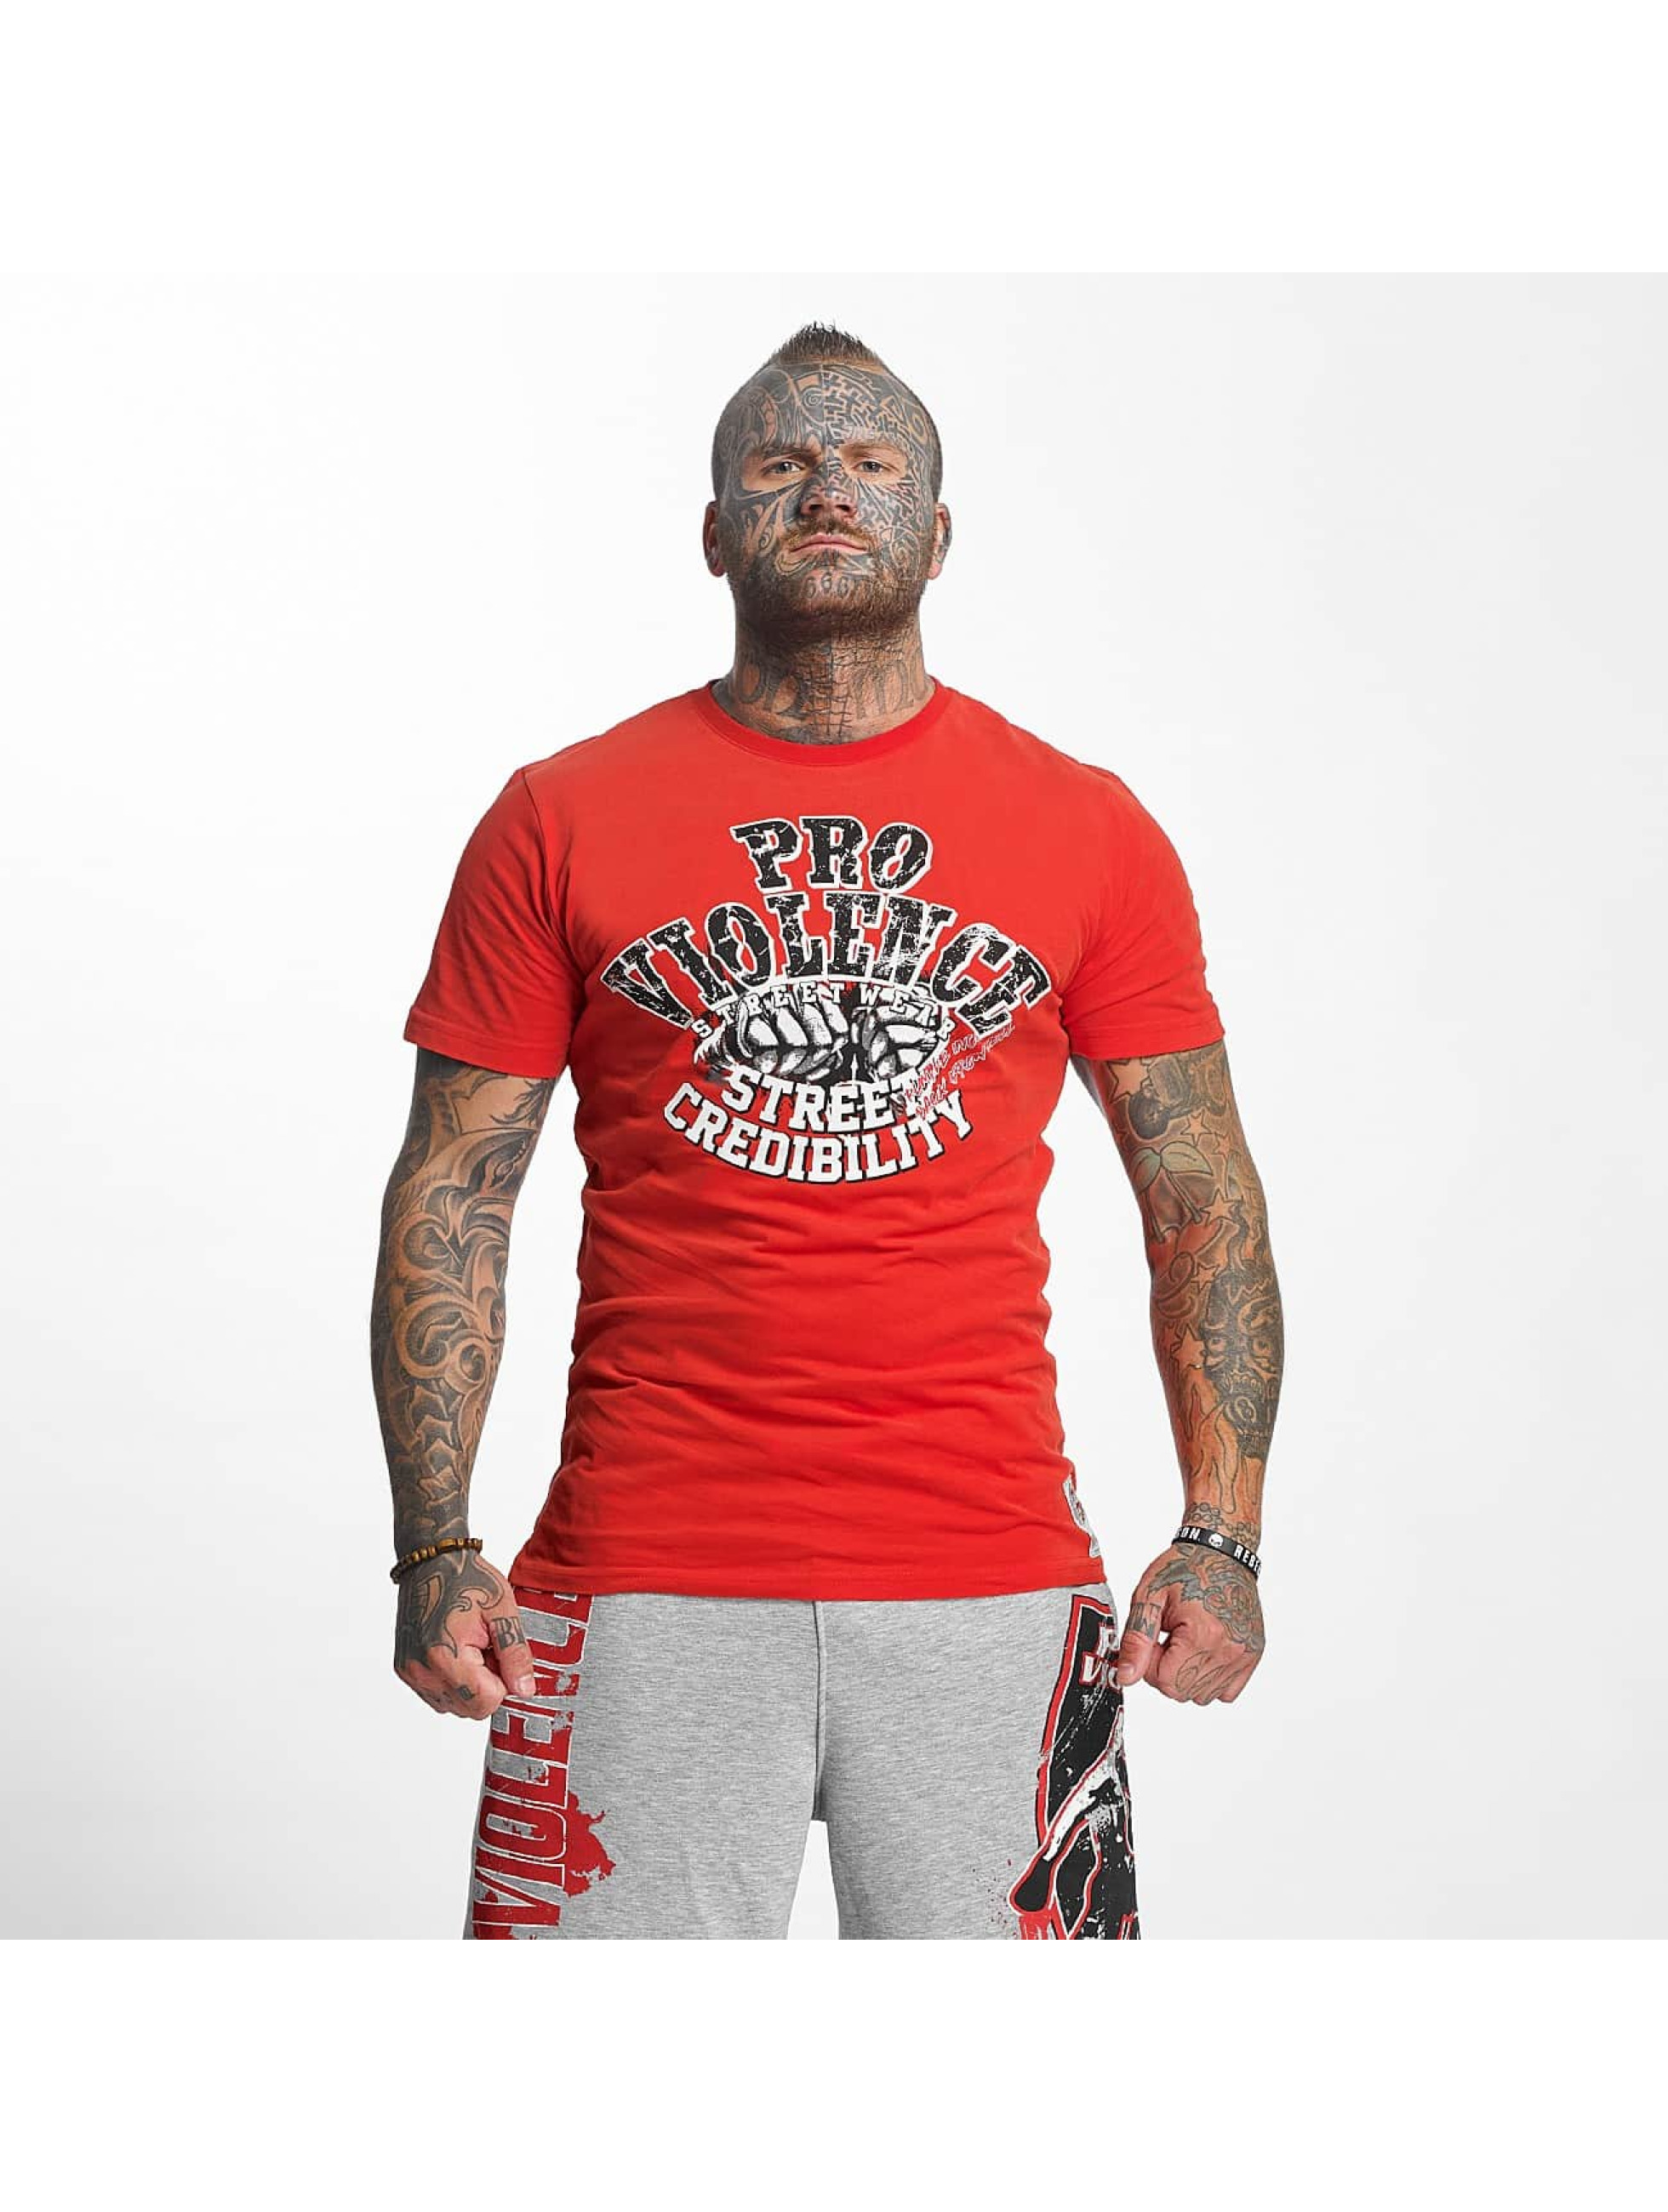 Pro Violence Streetwear T-Shirty Street Ceidbilty czerwony